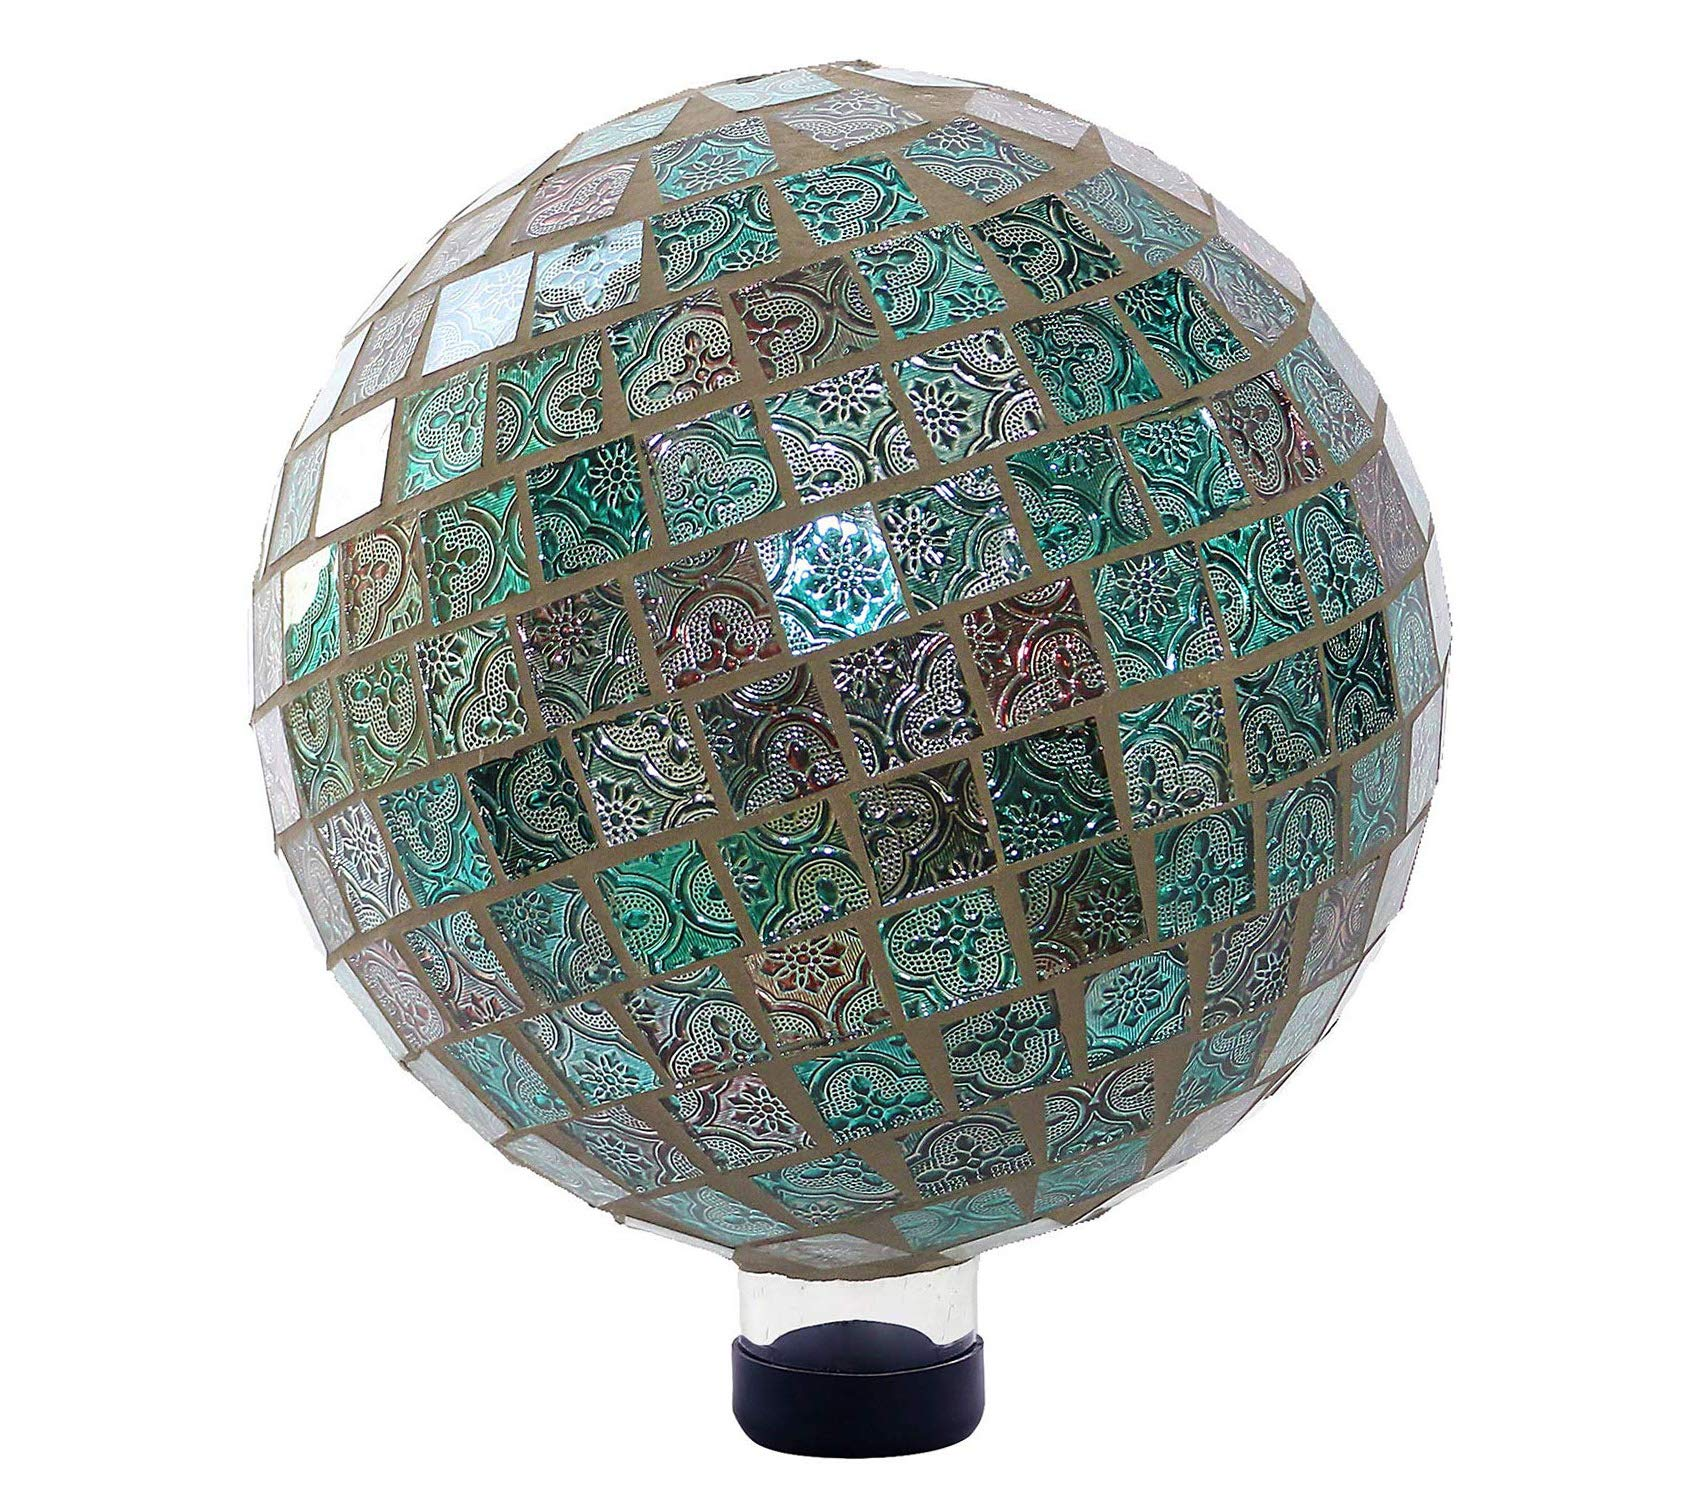 Outdoor Garden Backyard Décor Mosaic Gazing Globe, 11 Inch Tall Turquoise